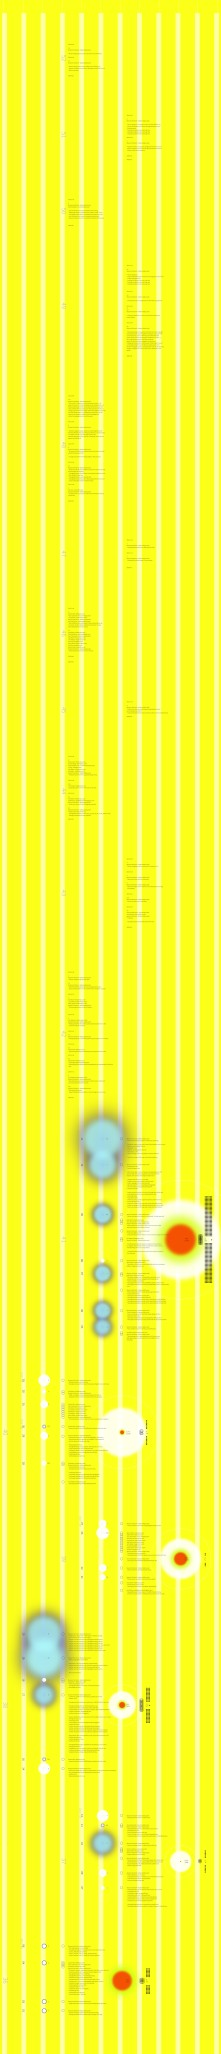 Visual ChangeLog: Broken Obelisk (sum total detail)